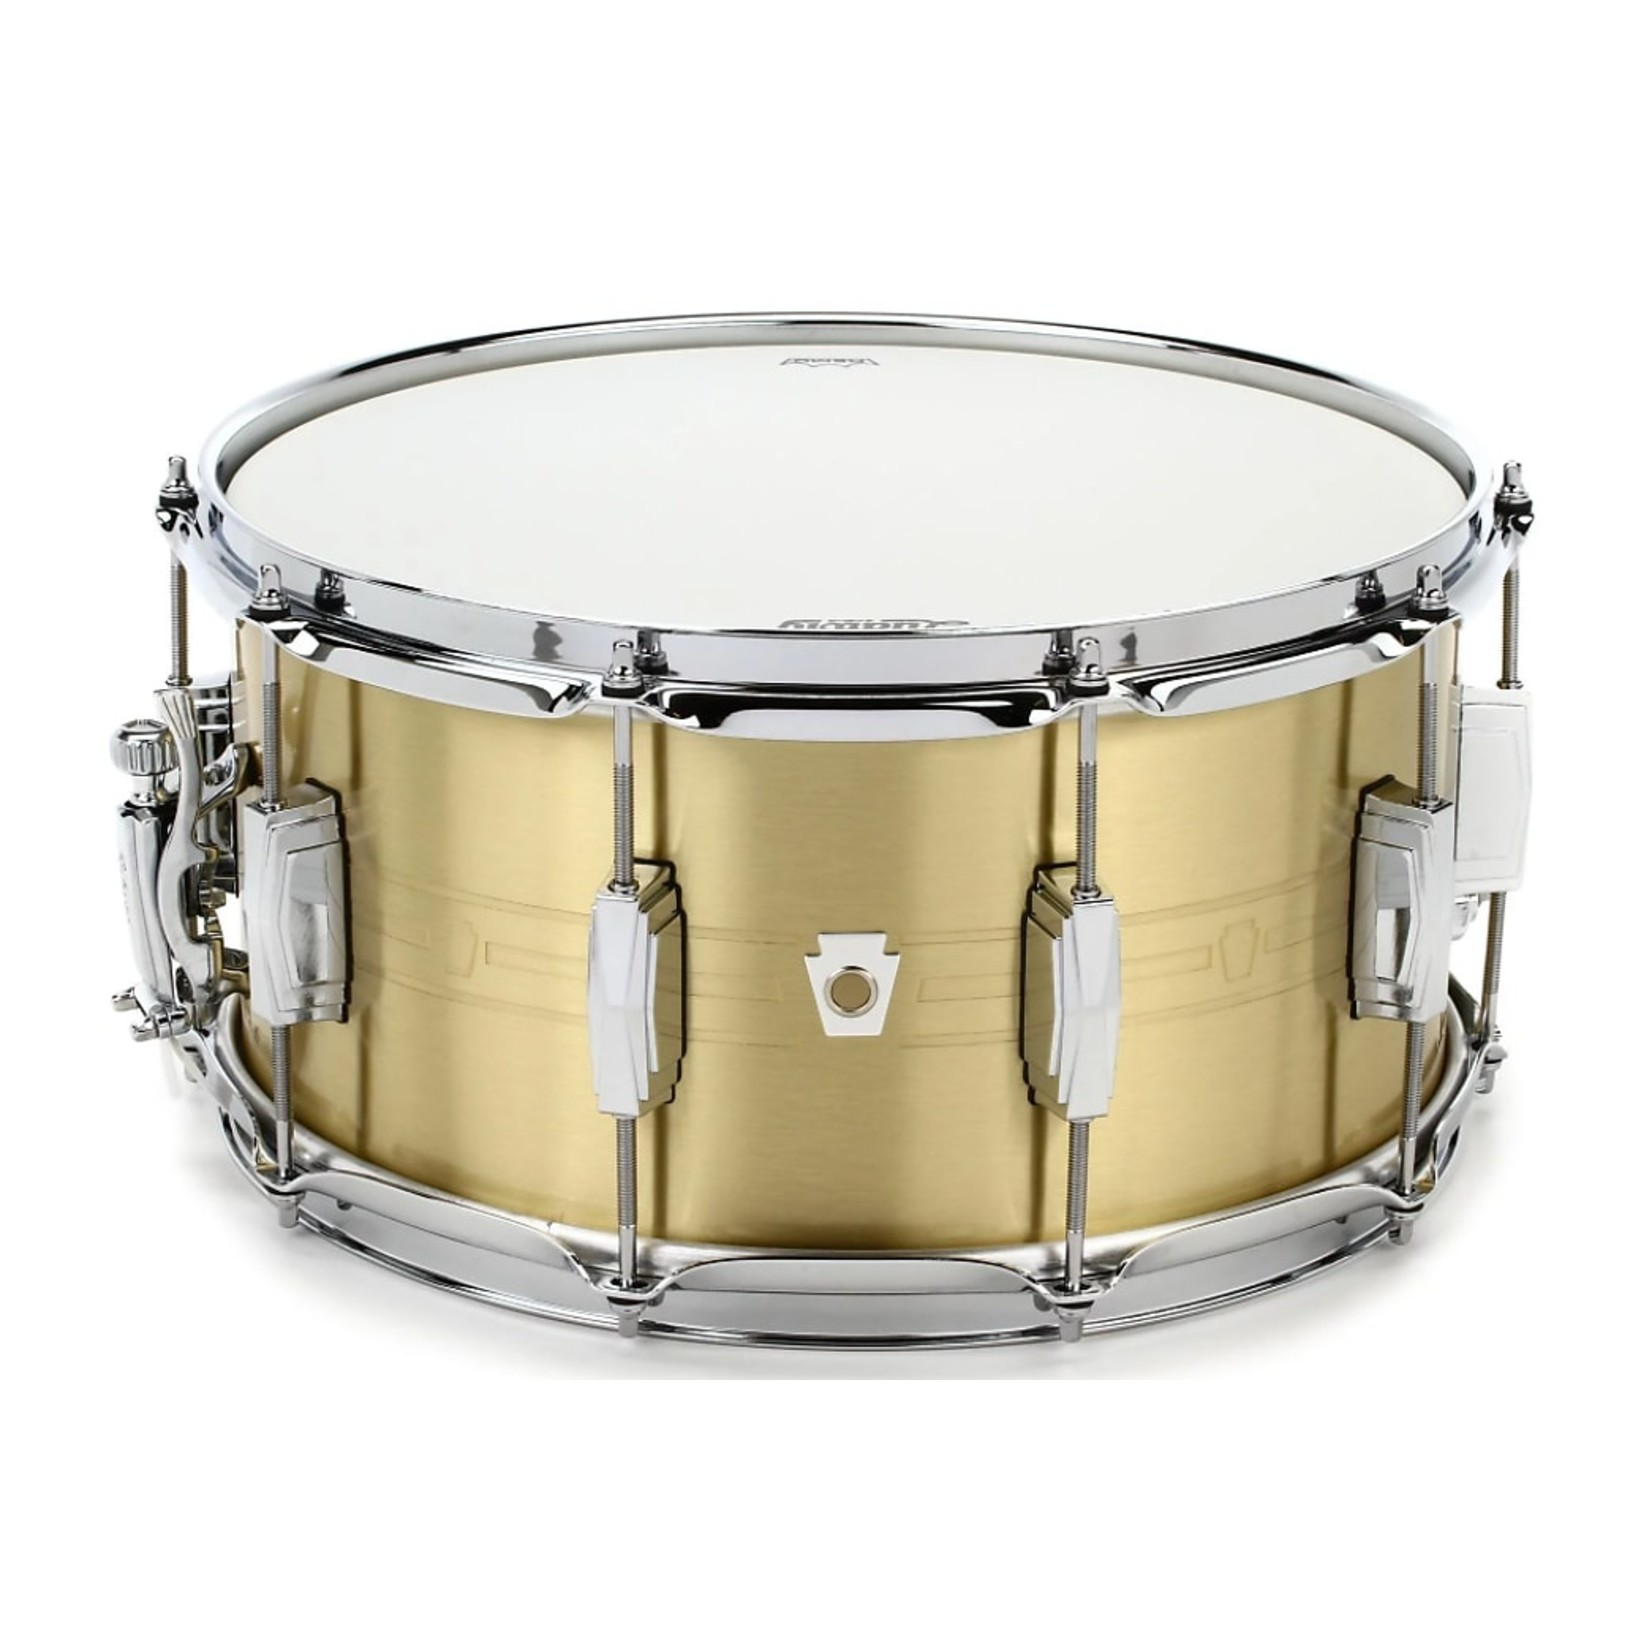 Ludwig Ludwig 7X14 Heirloom Brass Snare Drum